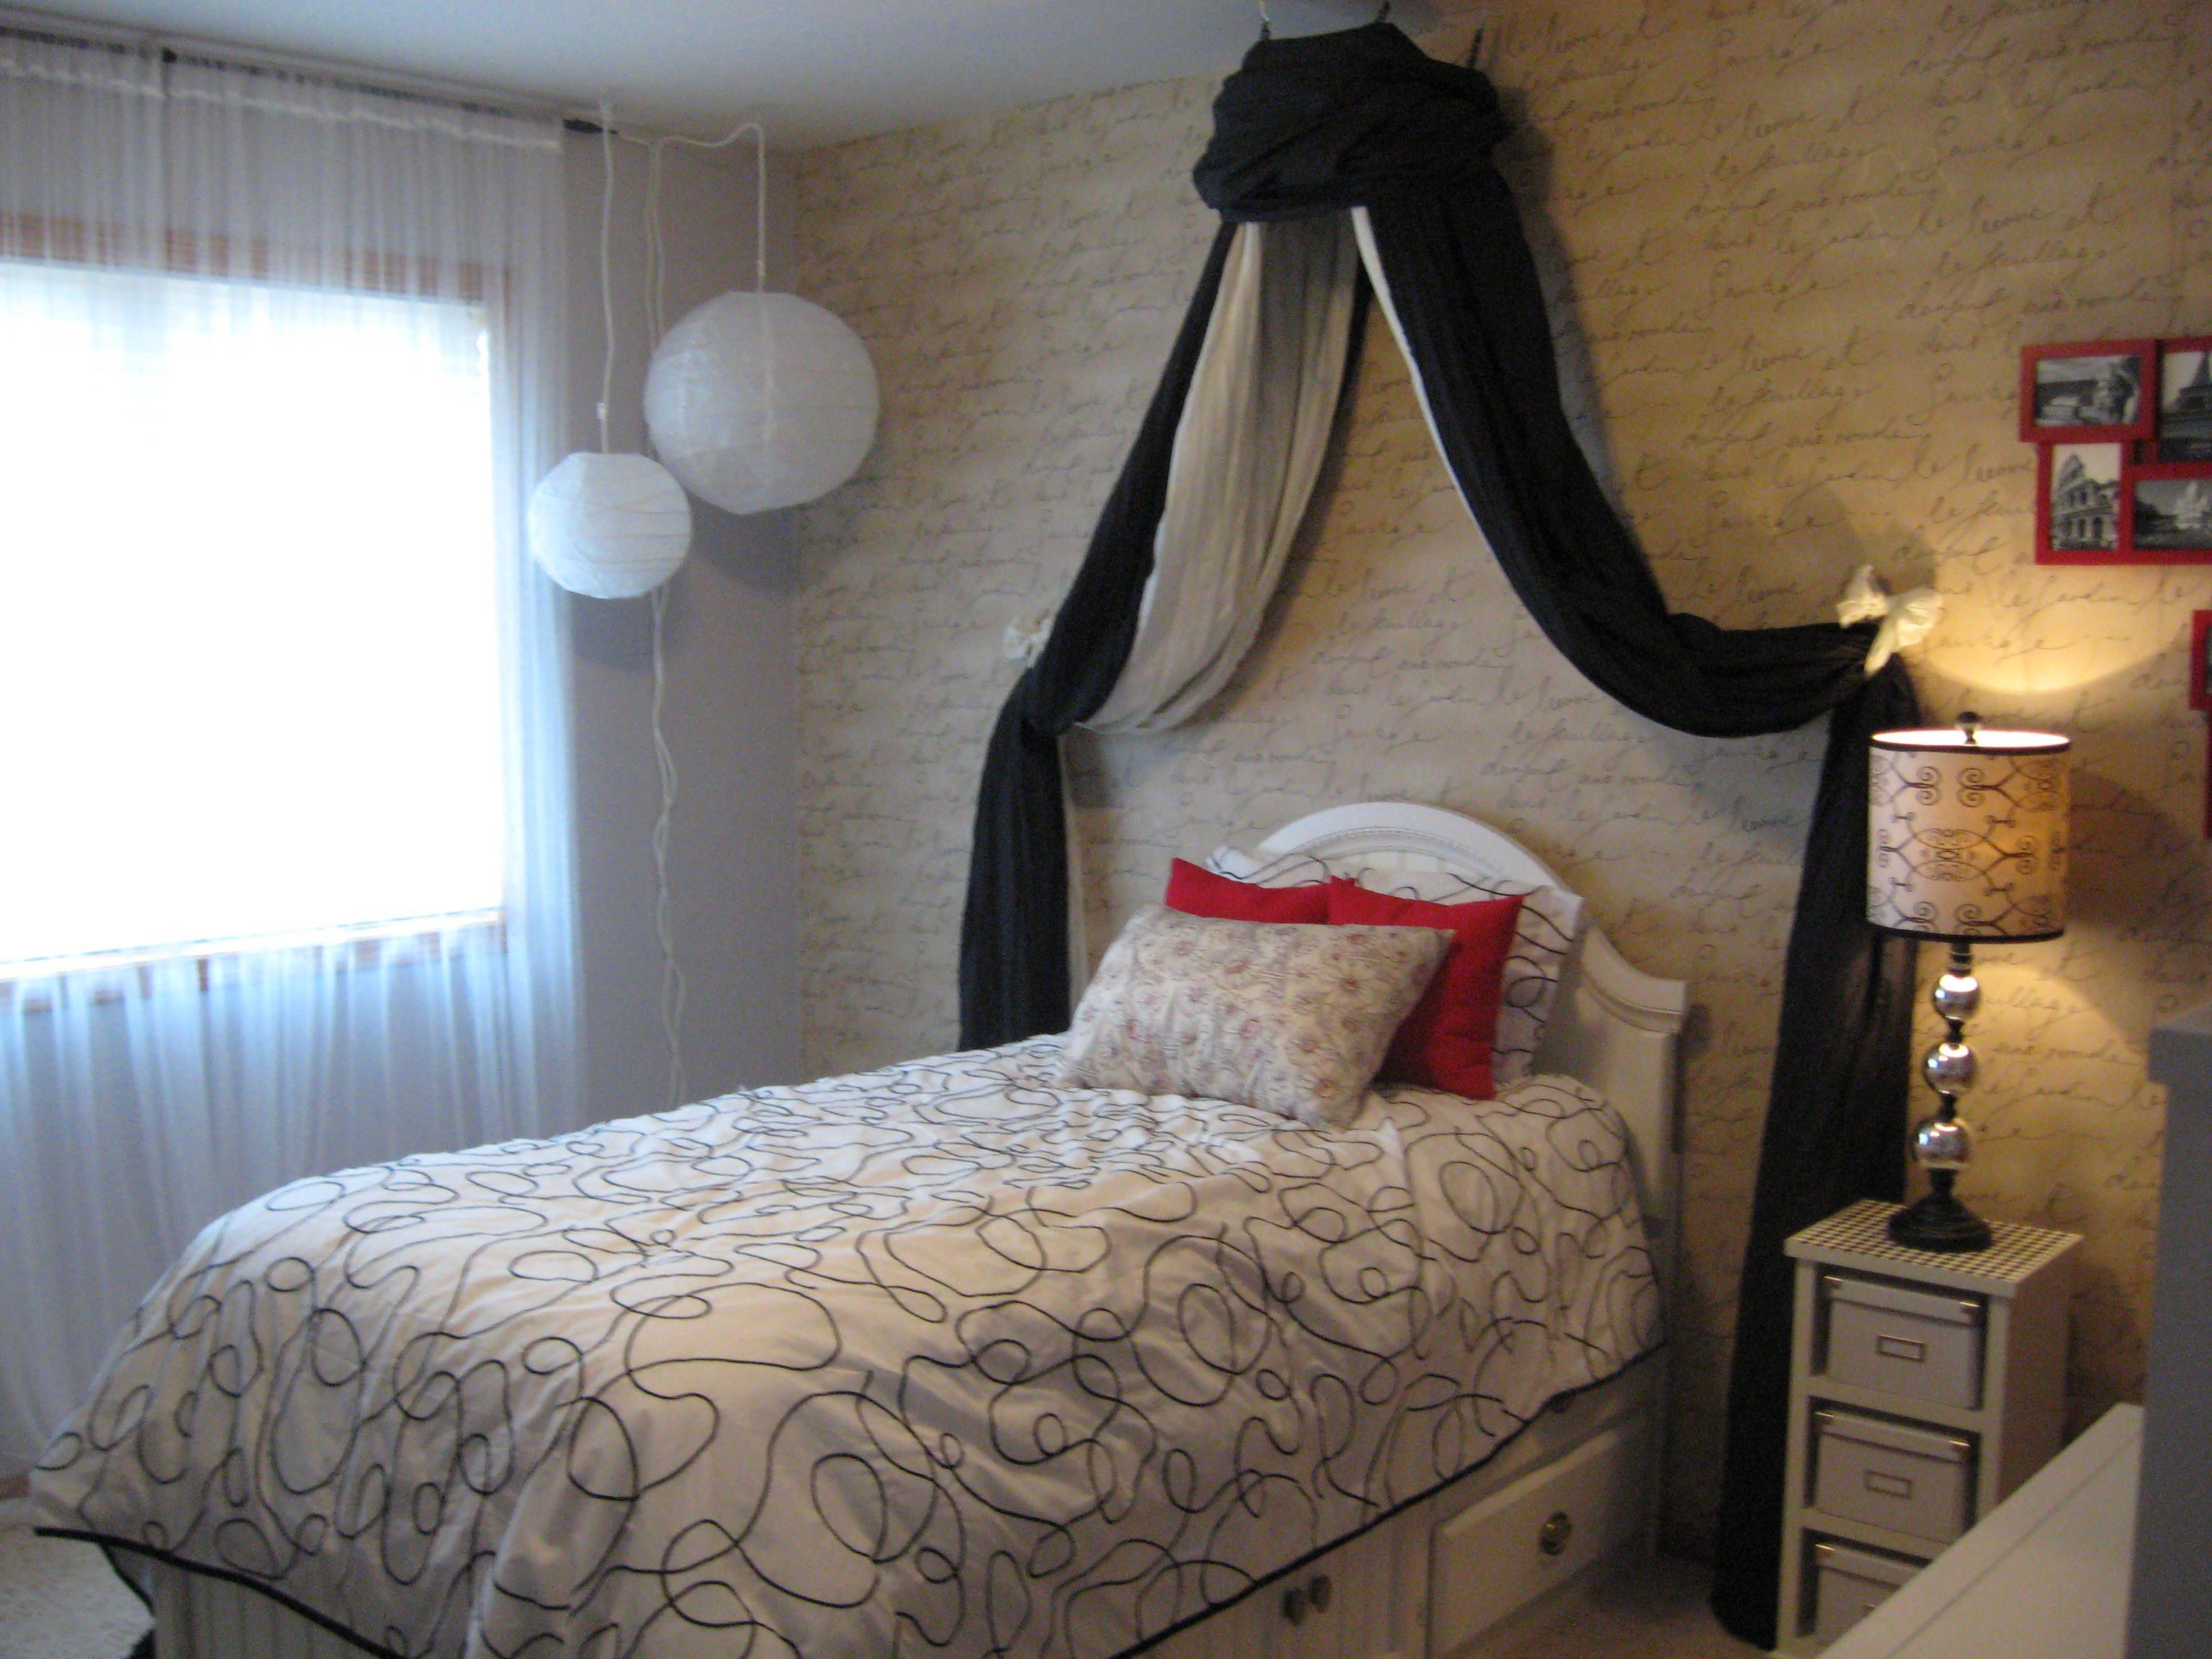 Paris Bedroom Wallpaper Teen Bedroom Paris Theme The Wallpaper Has French Inscriptions